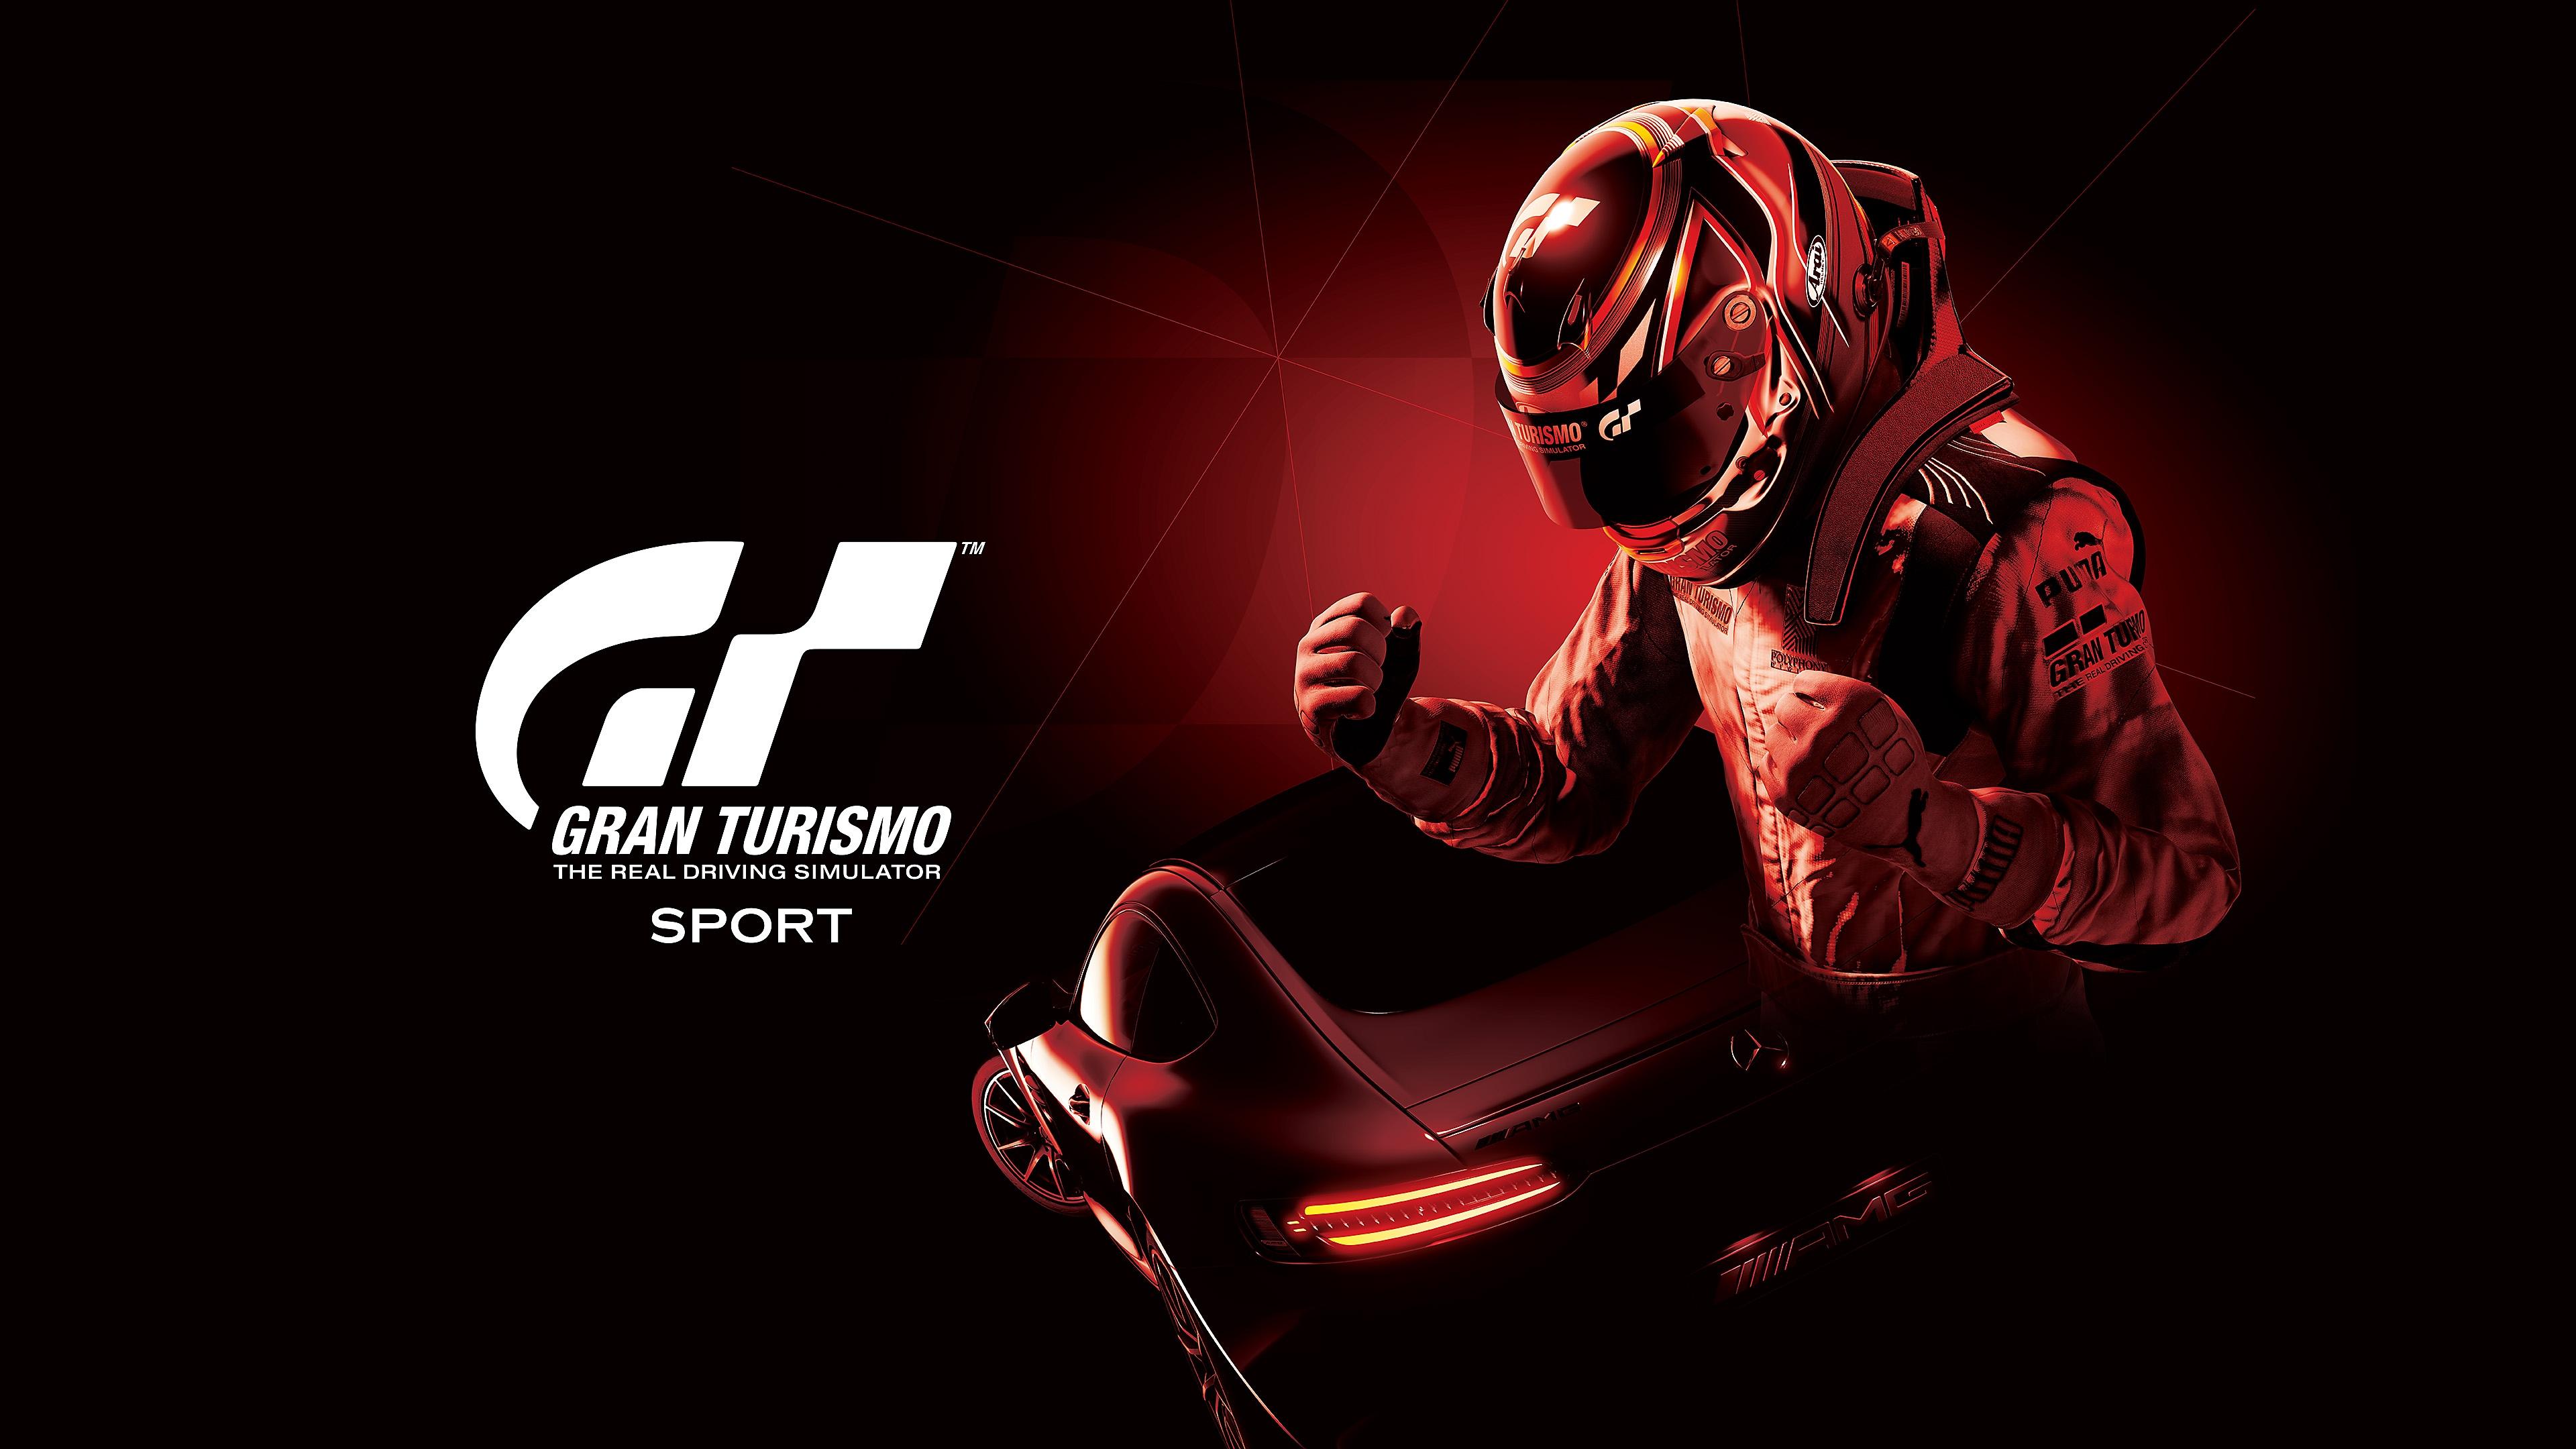 Gran Turismo Sport - العرض التشويقي